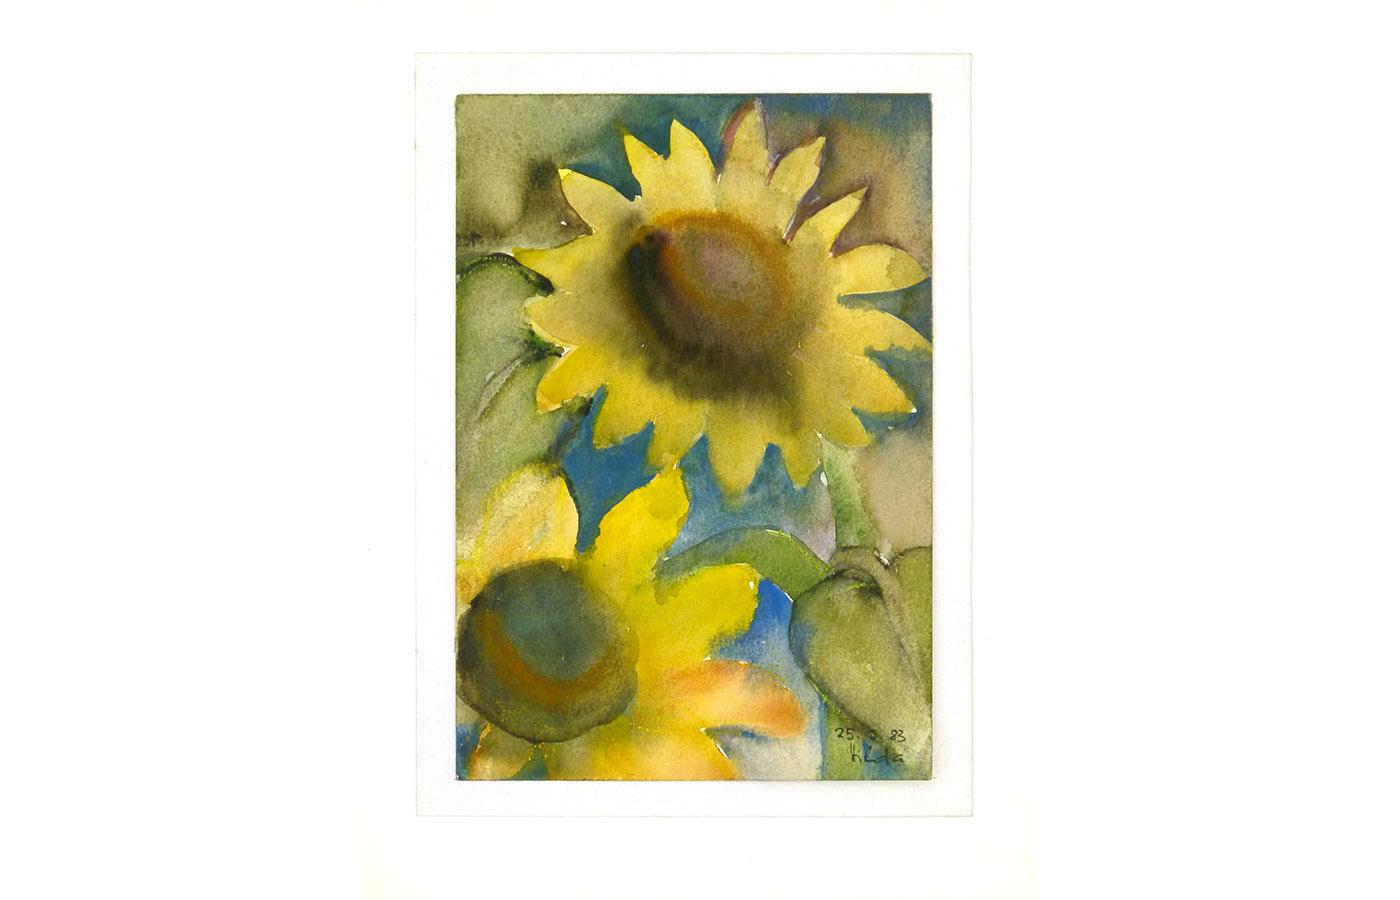 Blumen_0059_L1100365a